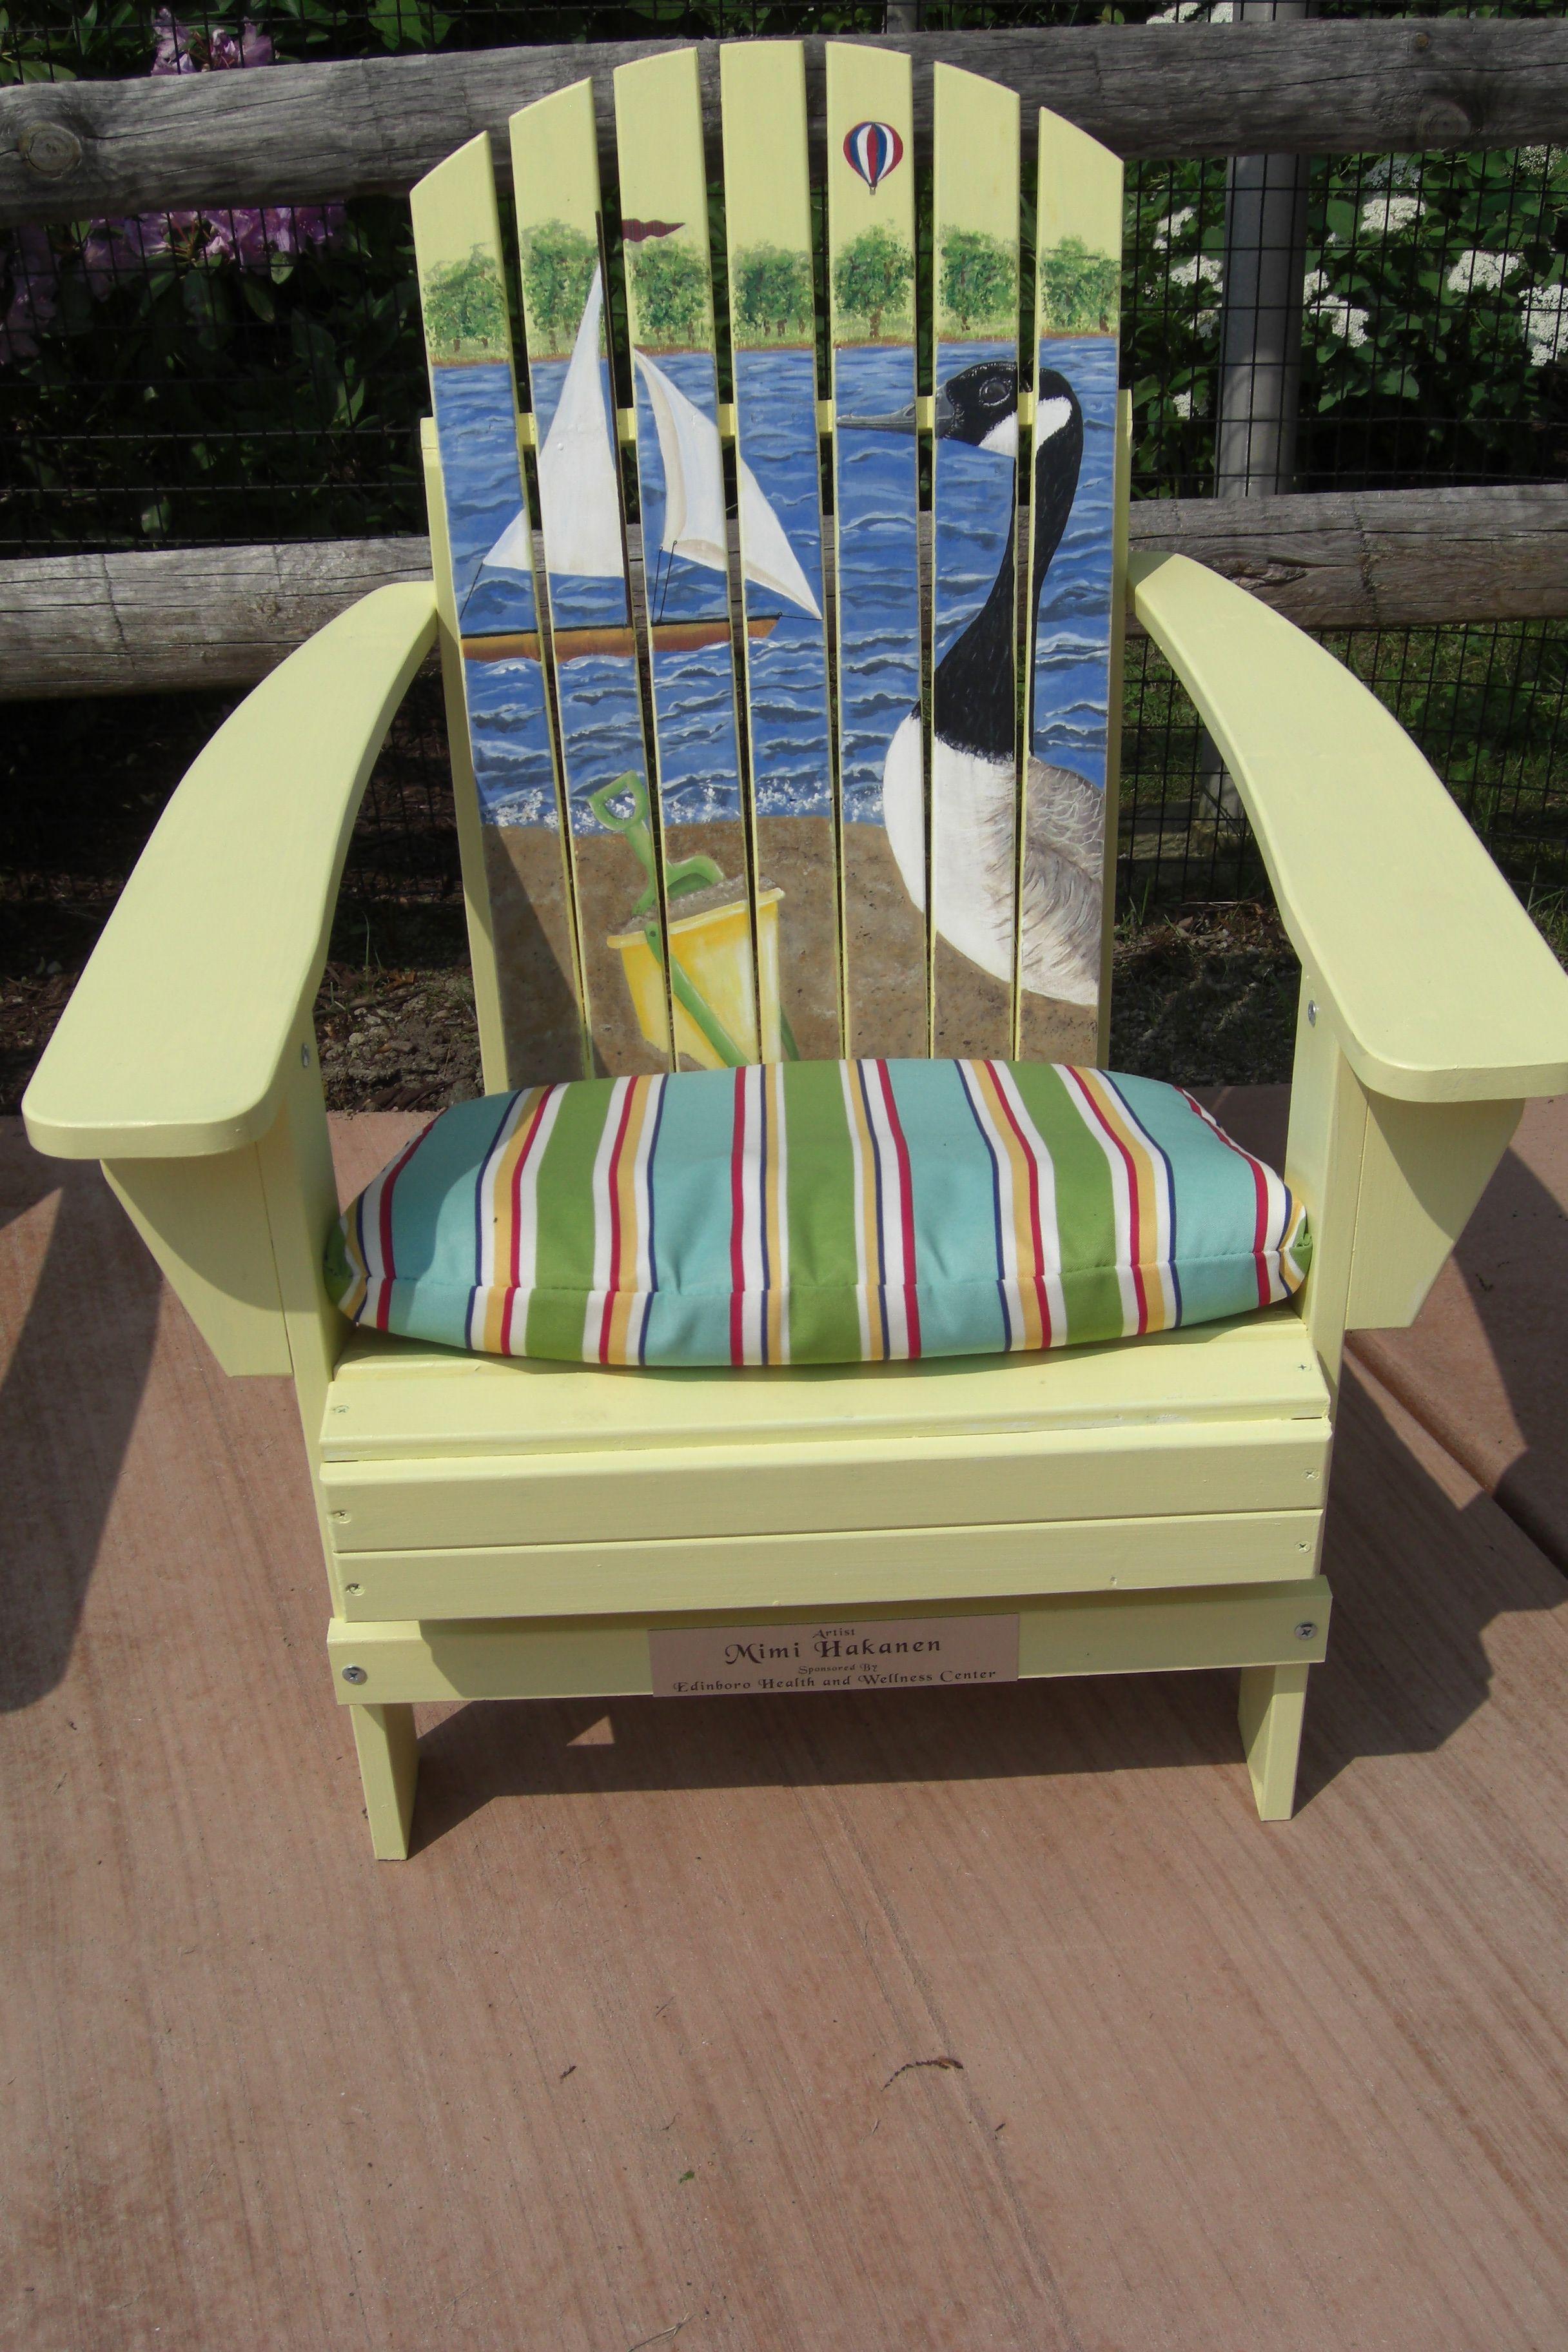 Painted Adirondack chair for Lakeside Home Association at Edinboro, PA.